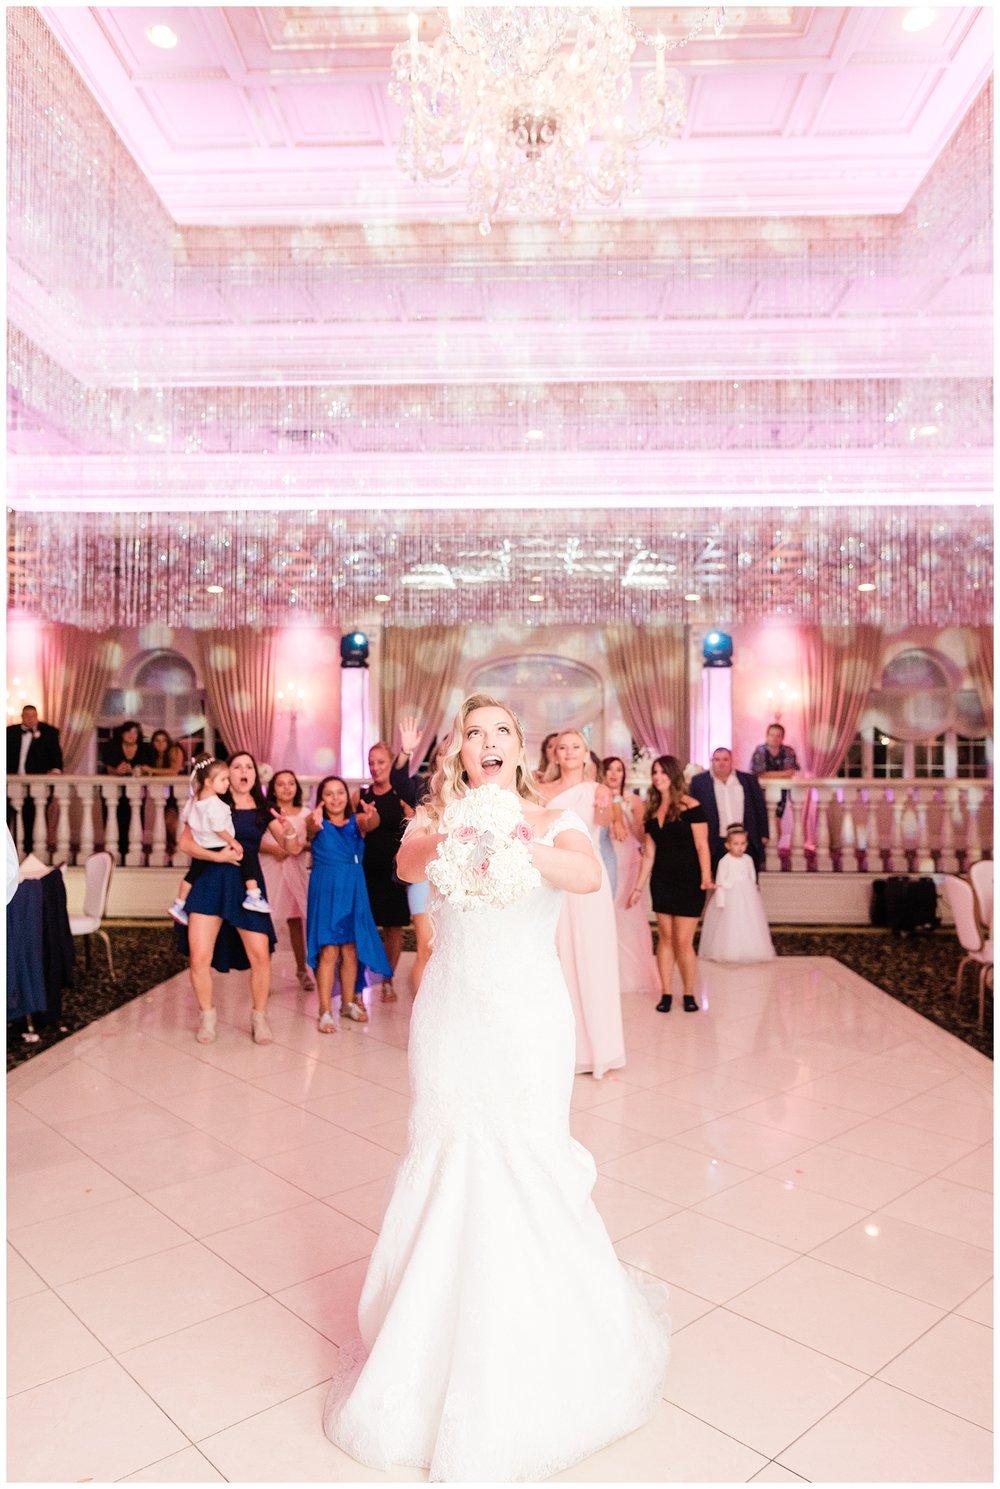 naninas-in-the-park-belleville-nj-wedding-photographer-photo_0210.jpg